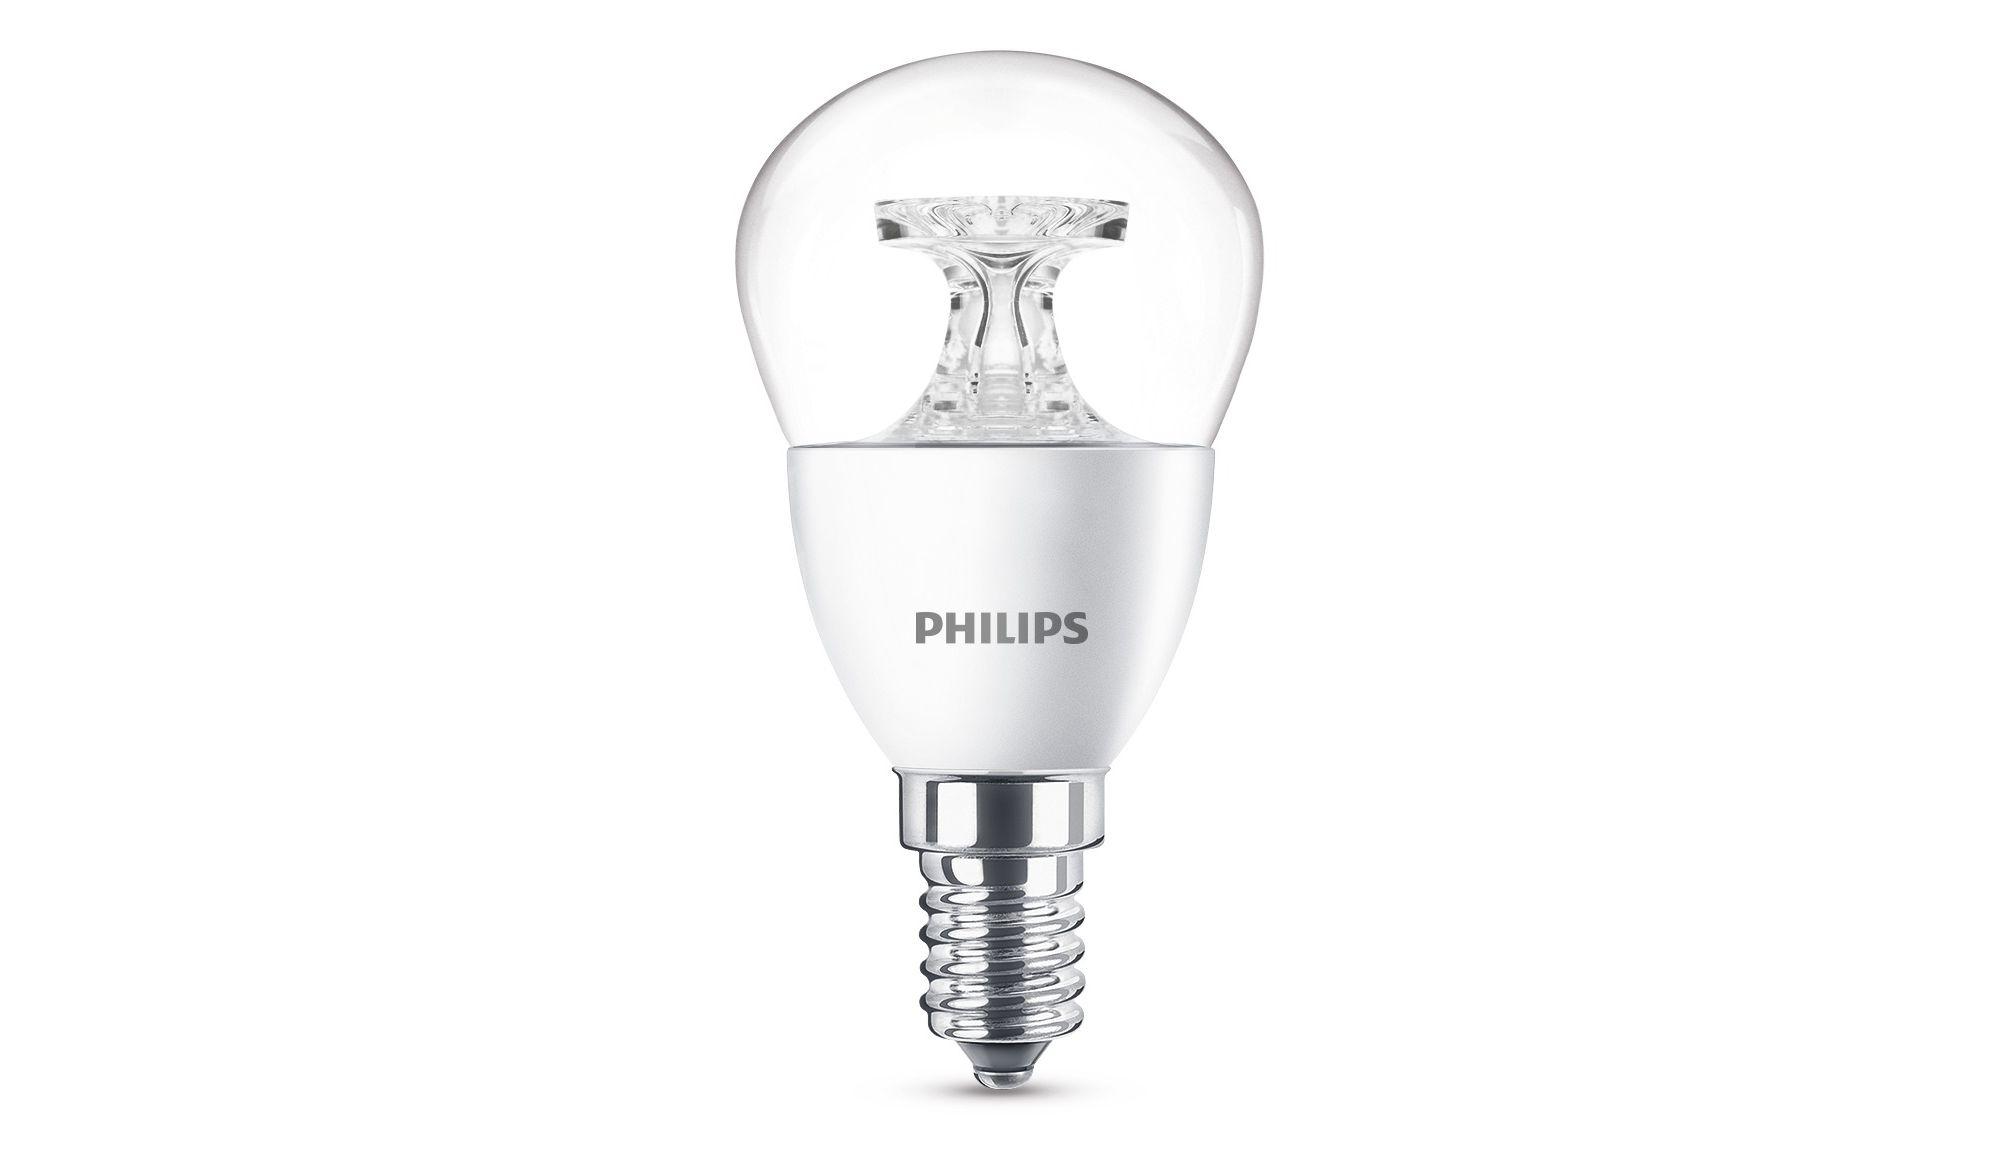 Philips Sferica 8718696454718